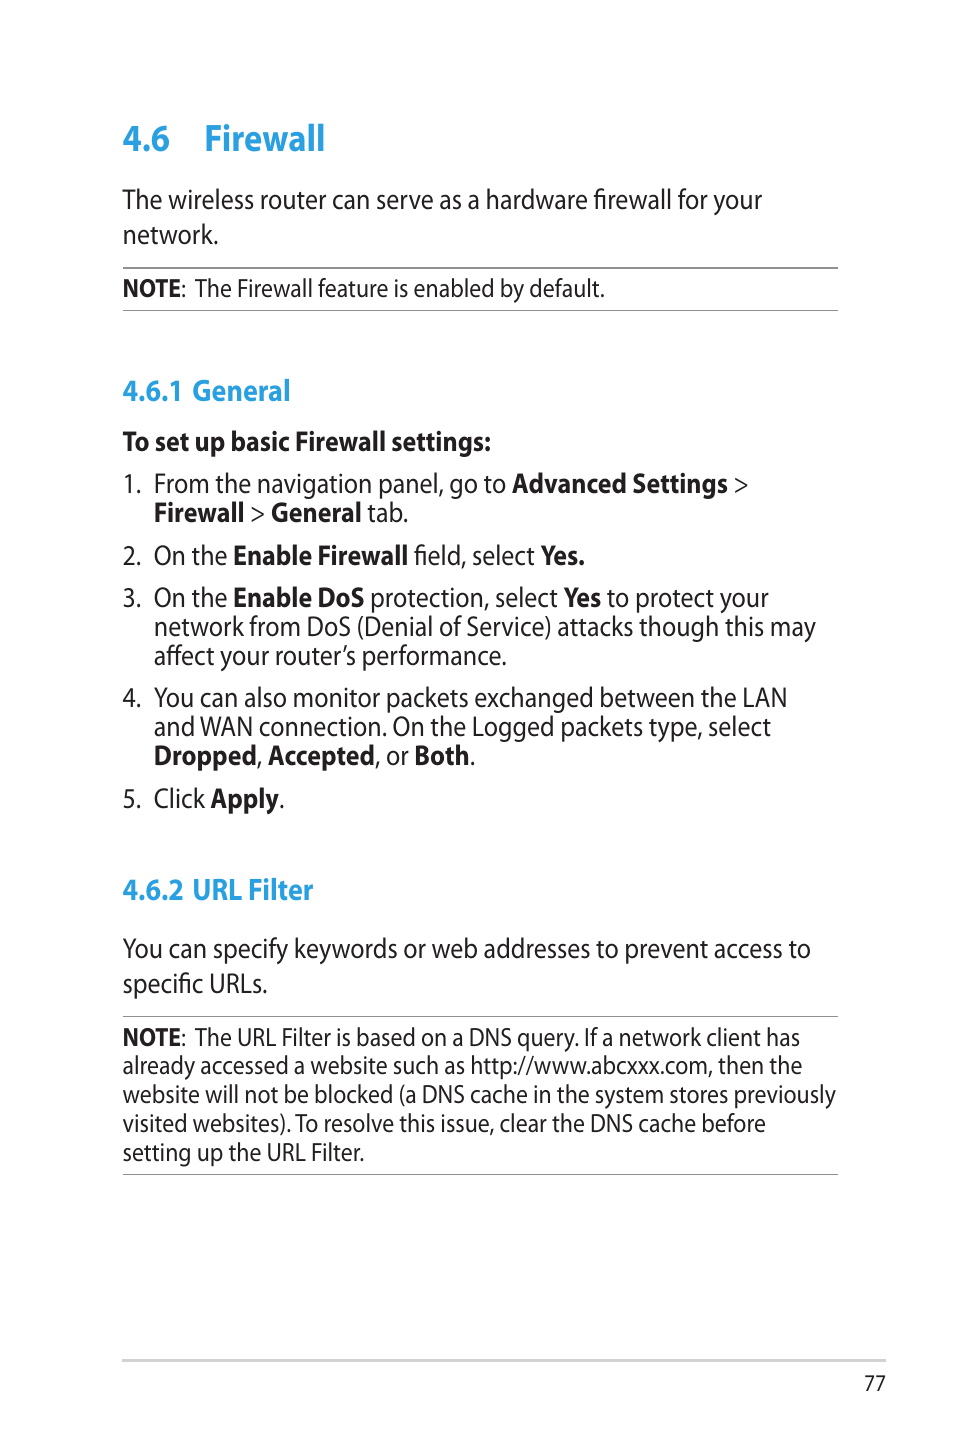 6 firewall, 1 general, 2 url filter | Asus RT-AC68U User